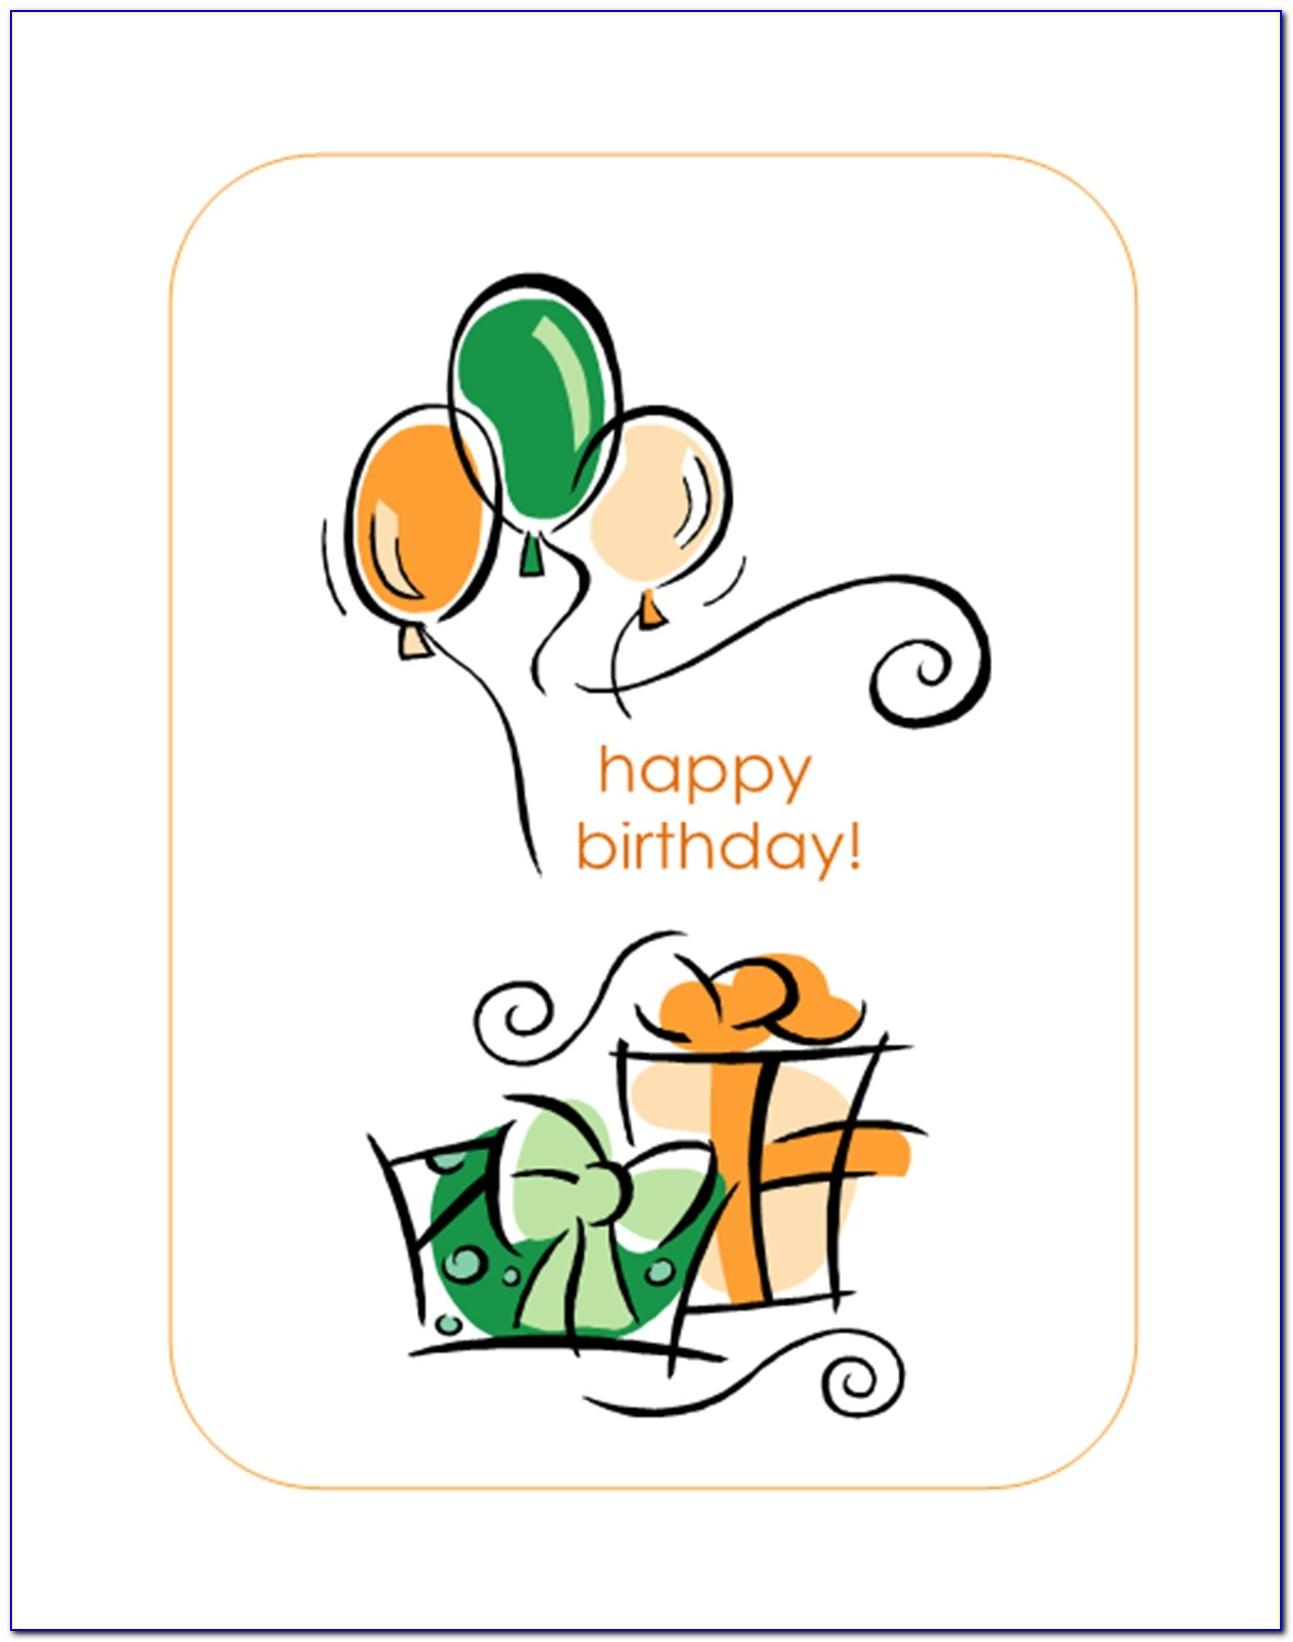 Funny Birthday Card Templates